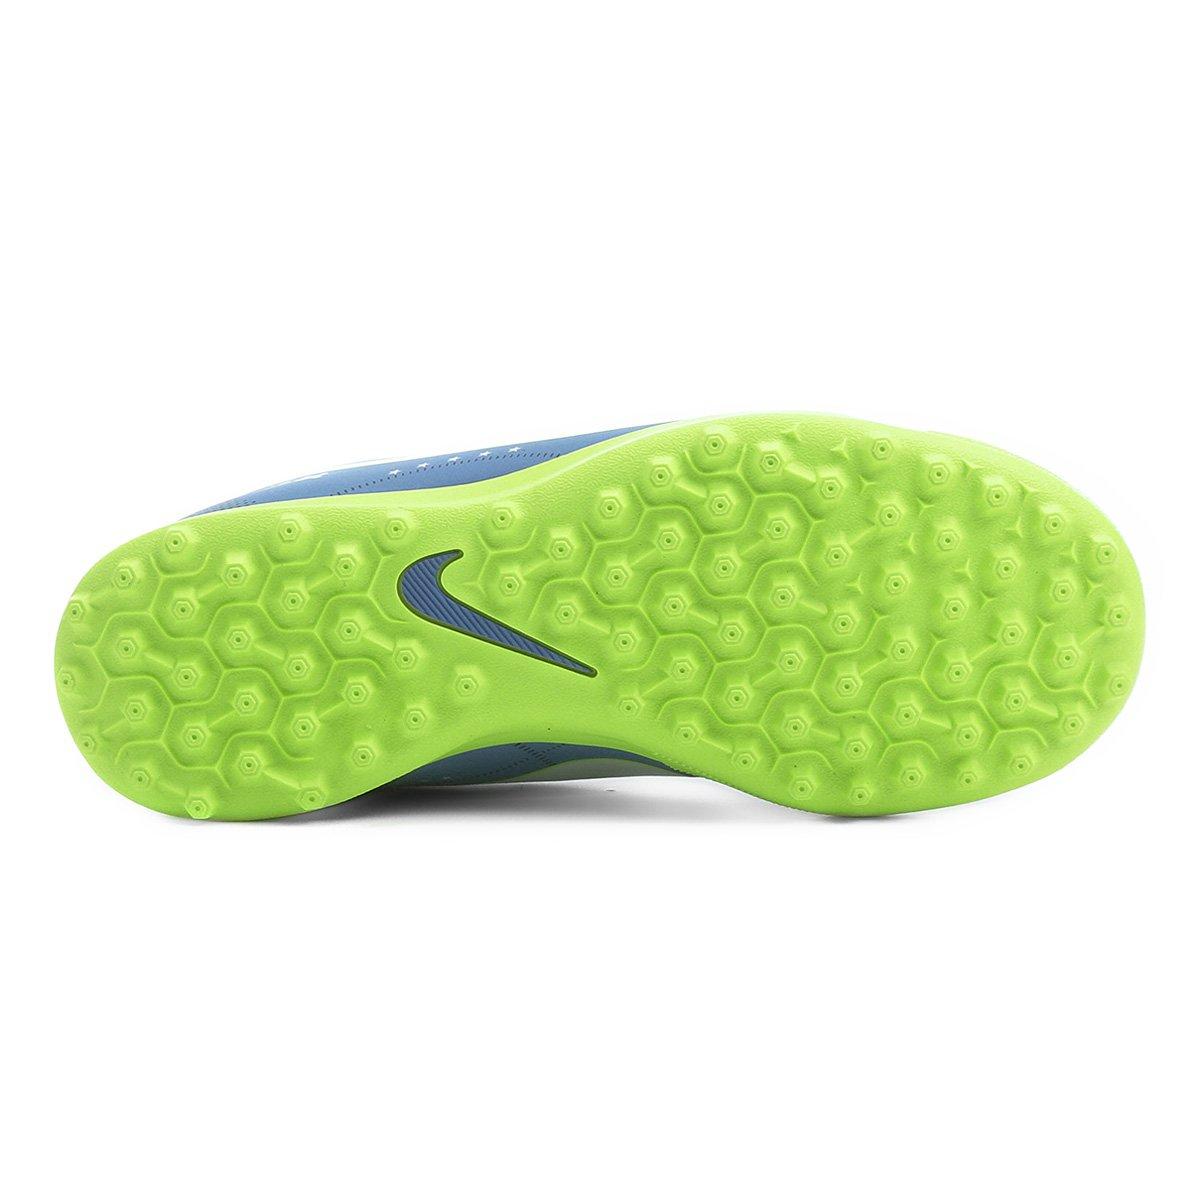 ... Chuteira Society Infantil Nike Mercurial Vortex 3 Neymar Jr TF ... 88f35730d713d